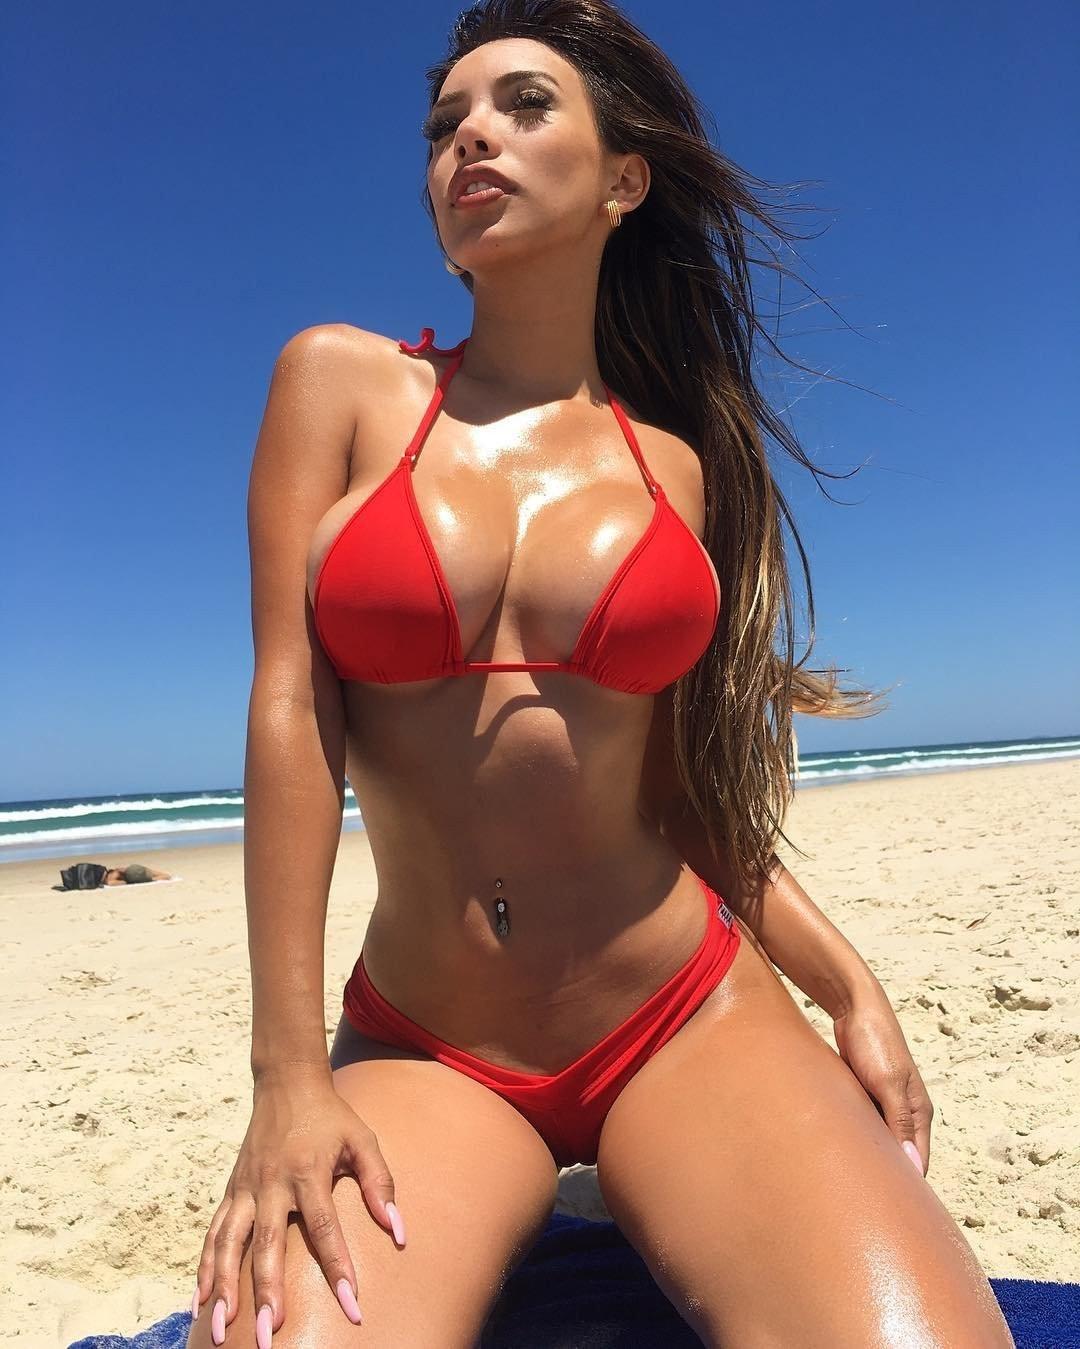 Busty amateur girls in bikini